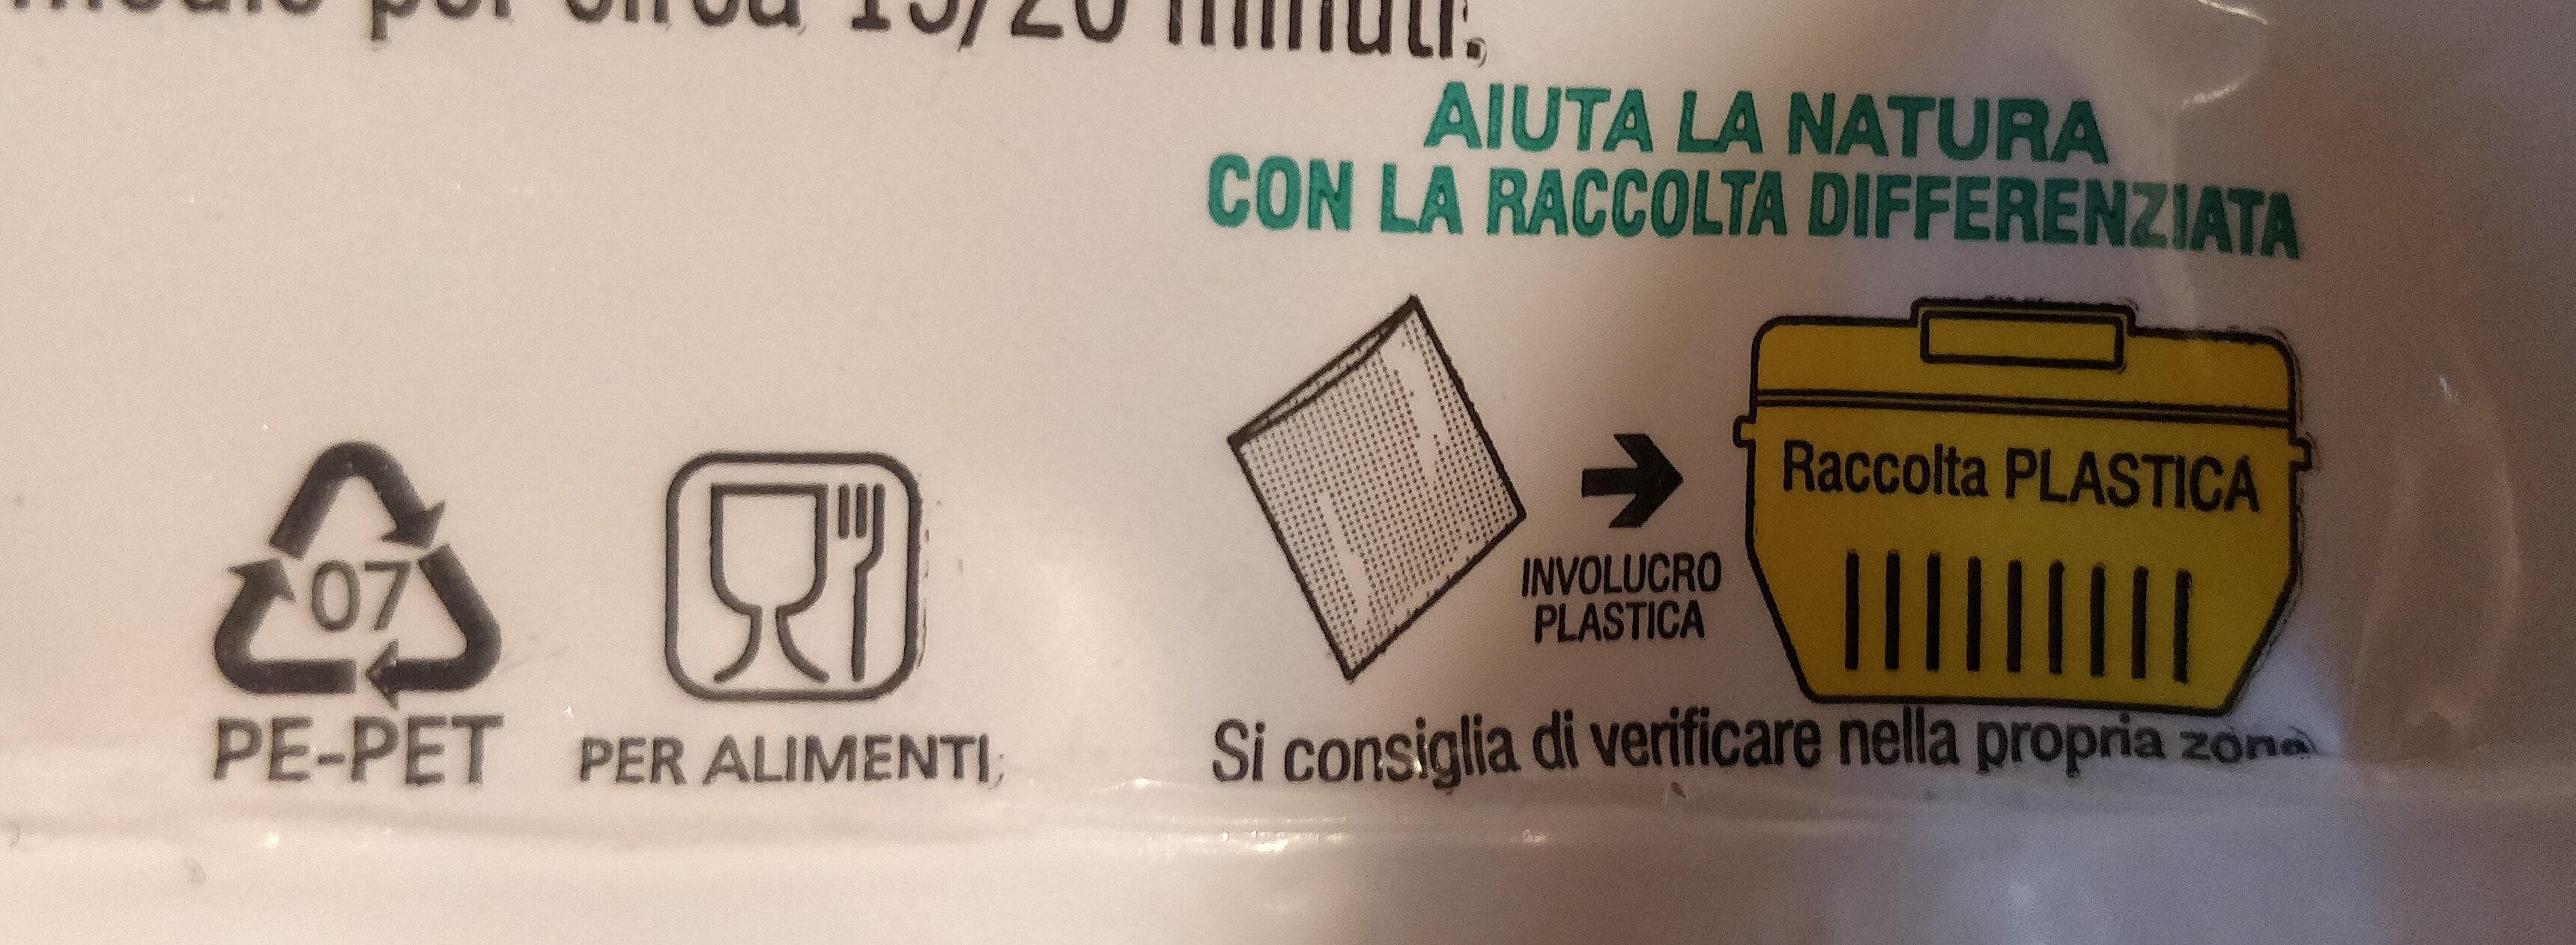 filetti di pesce San Pietro - Recyclinginstructies en / of verpakkingsinformatie - it